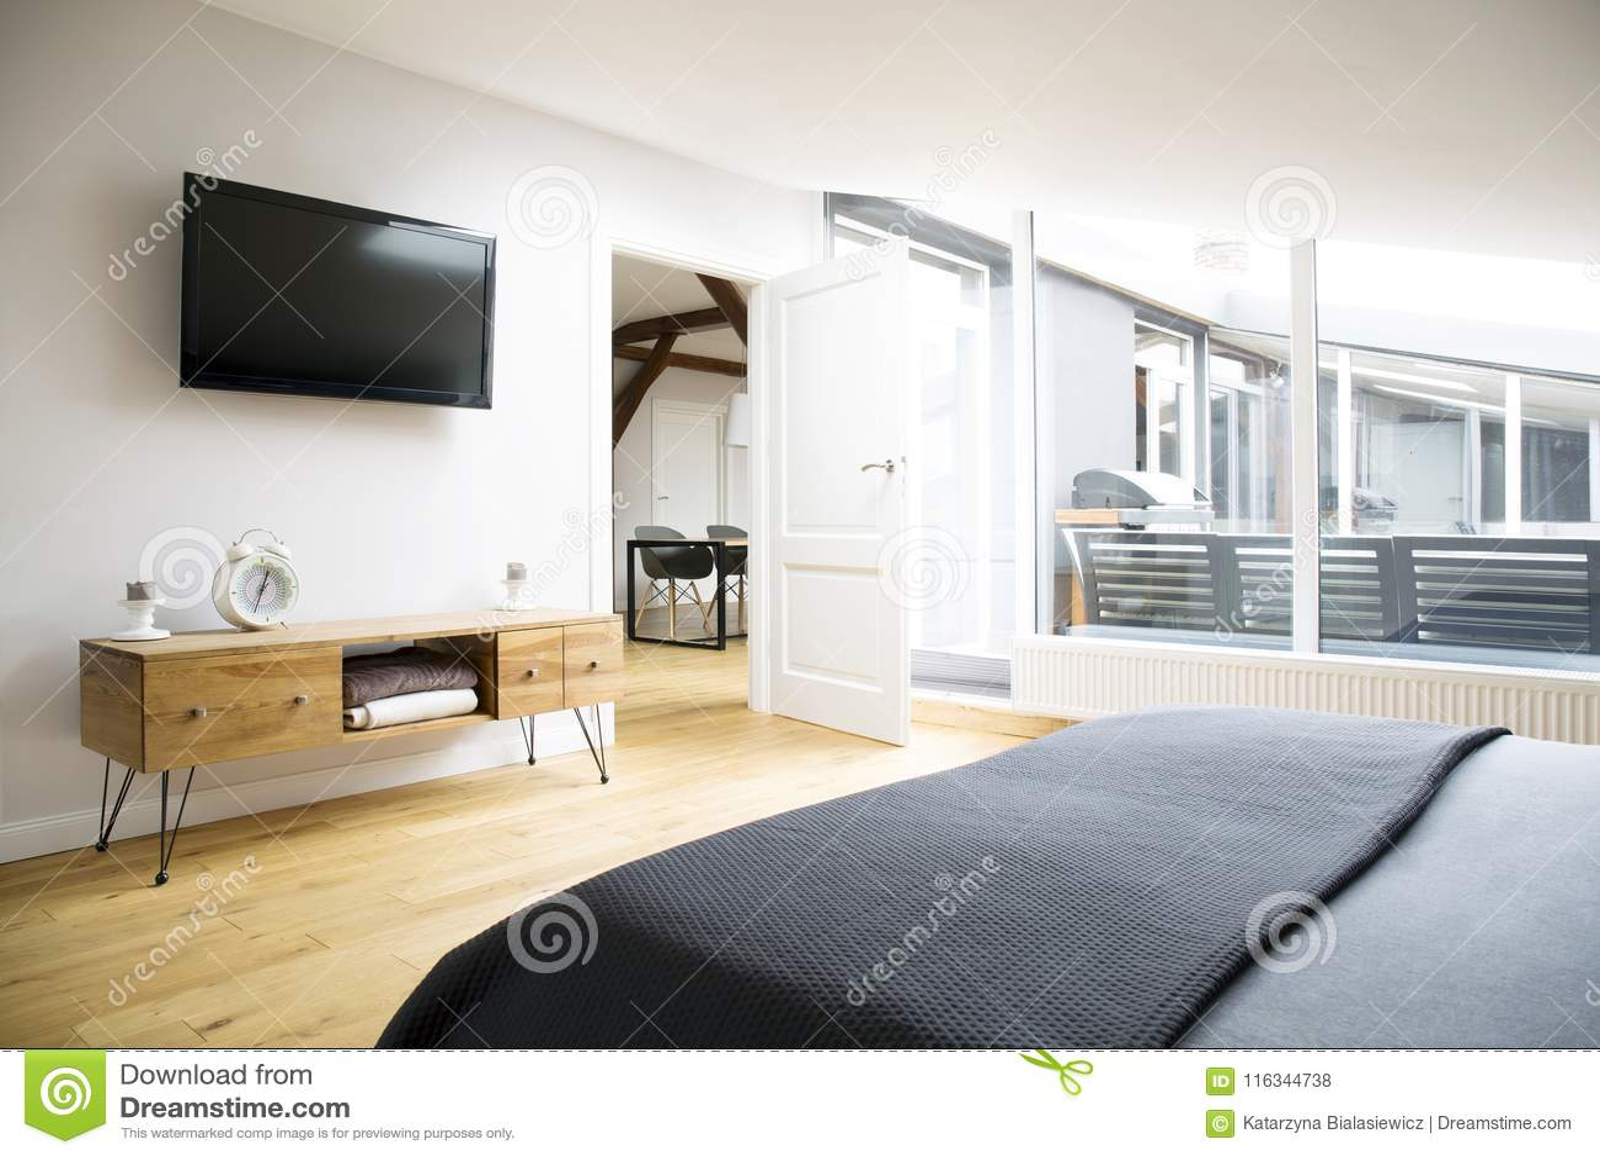 TV i gabinet w mieszkaniu